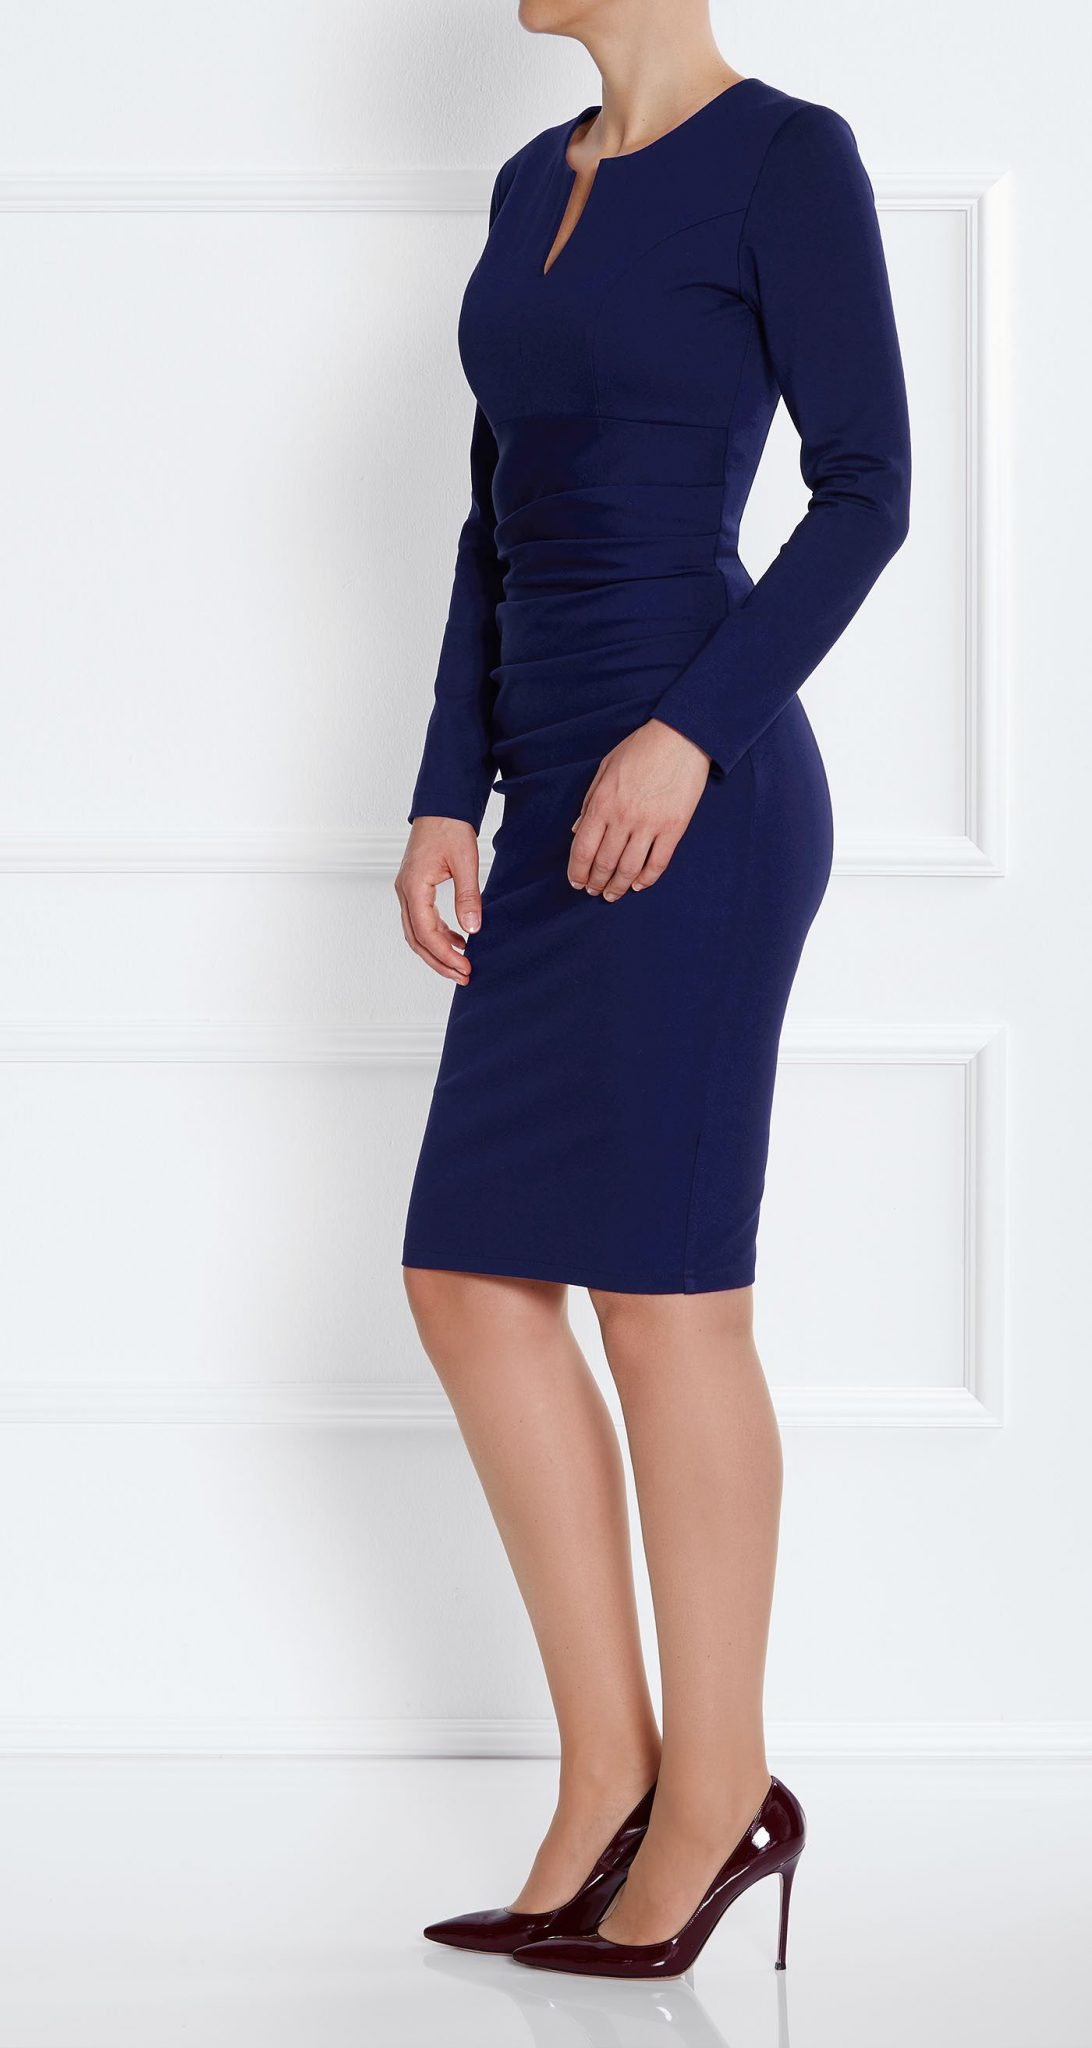 AMCO_fashion_Savanna_Dress_Night_Blue_B